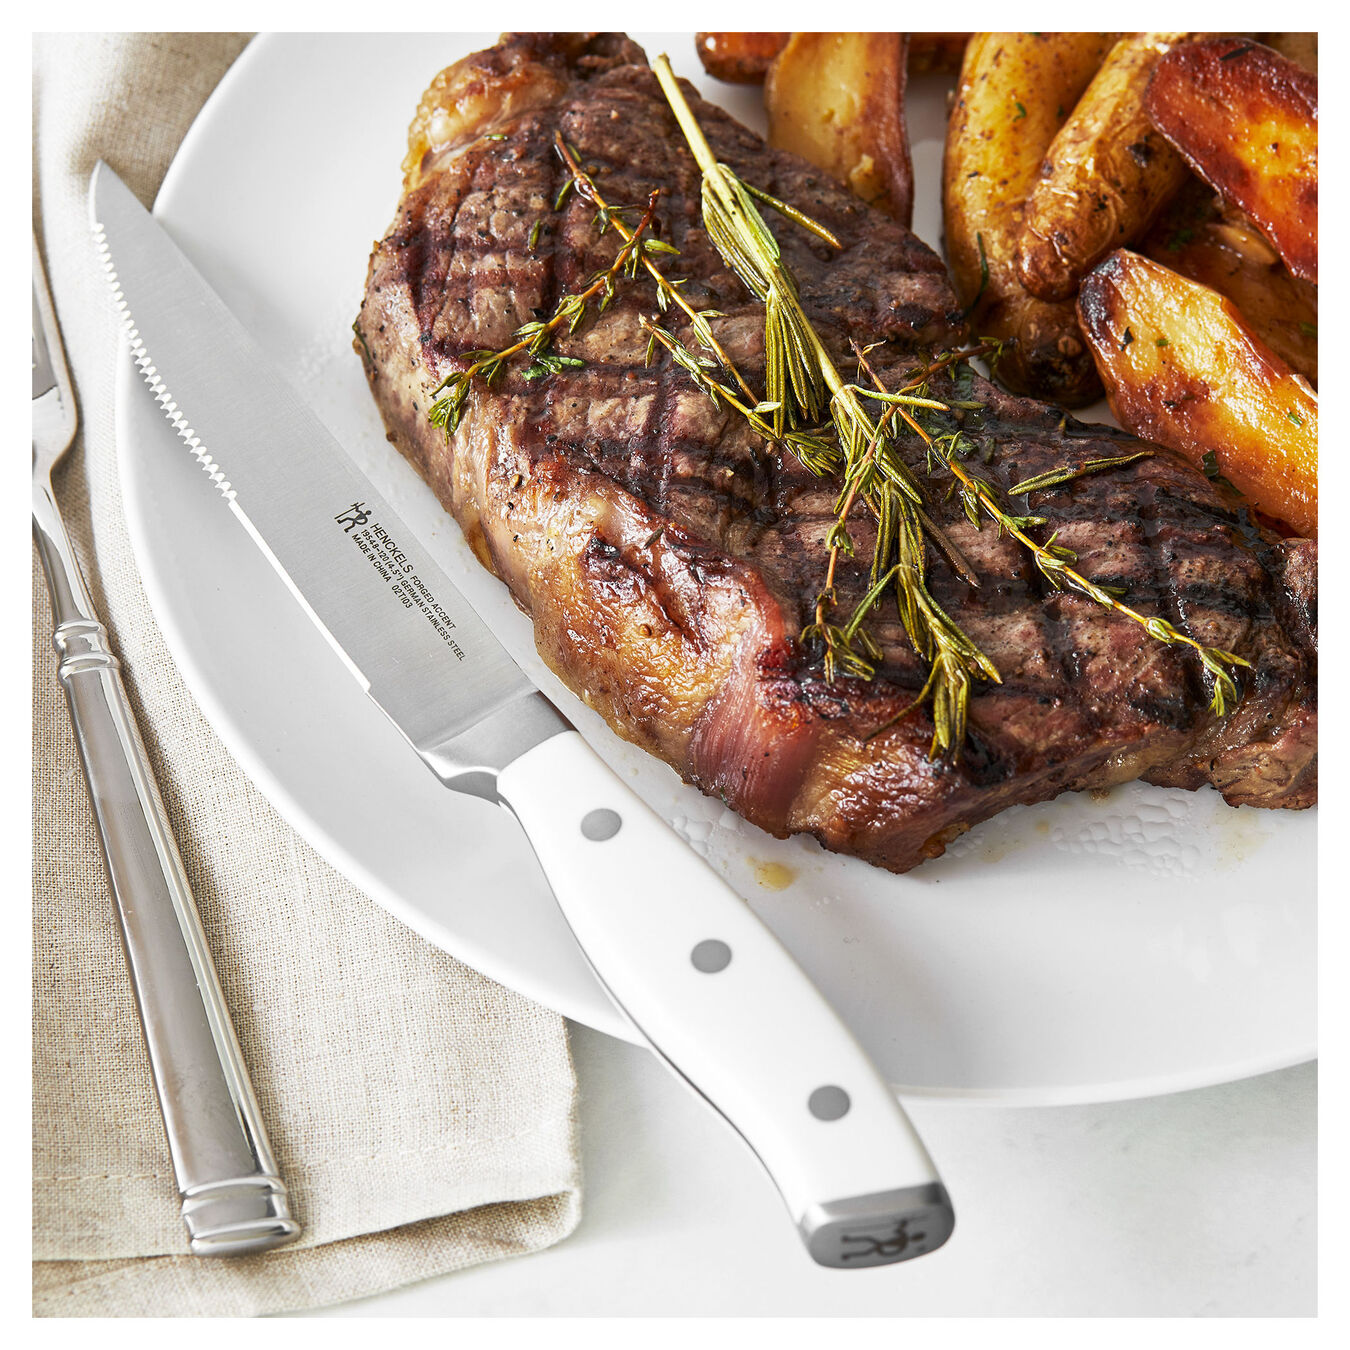 4-pc, Steak Knife Set - White,,large 3